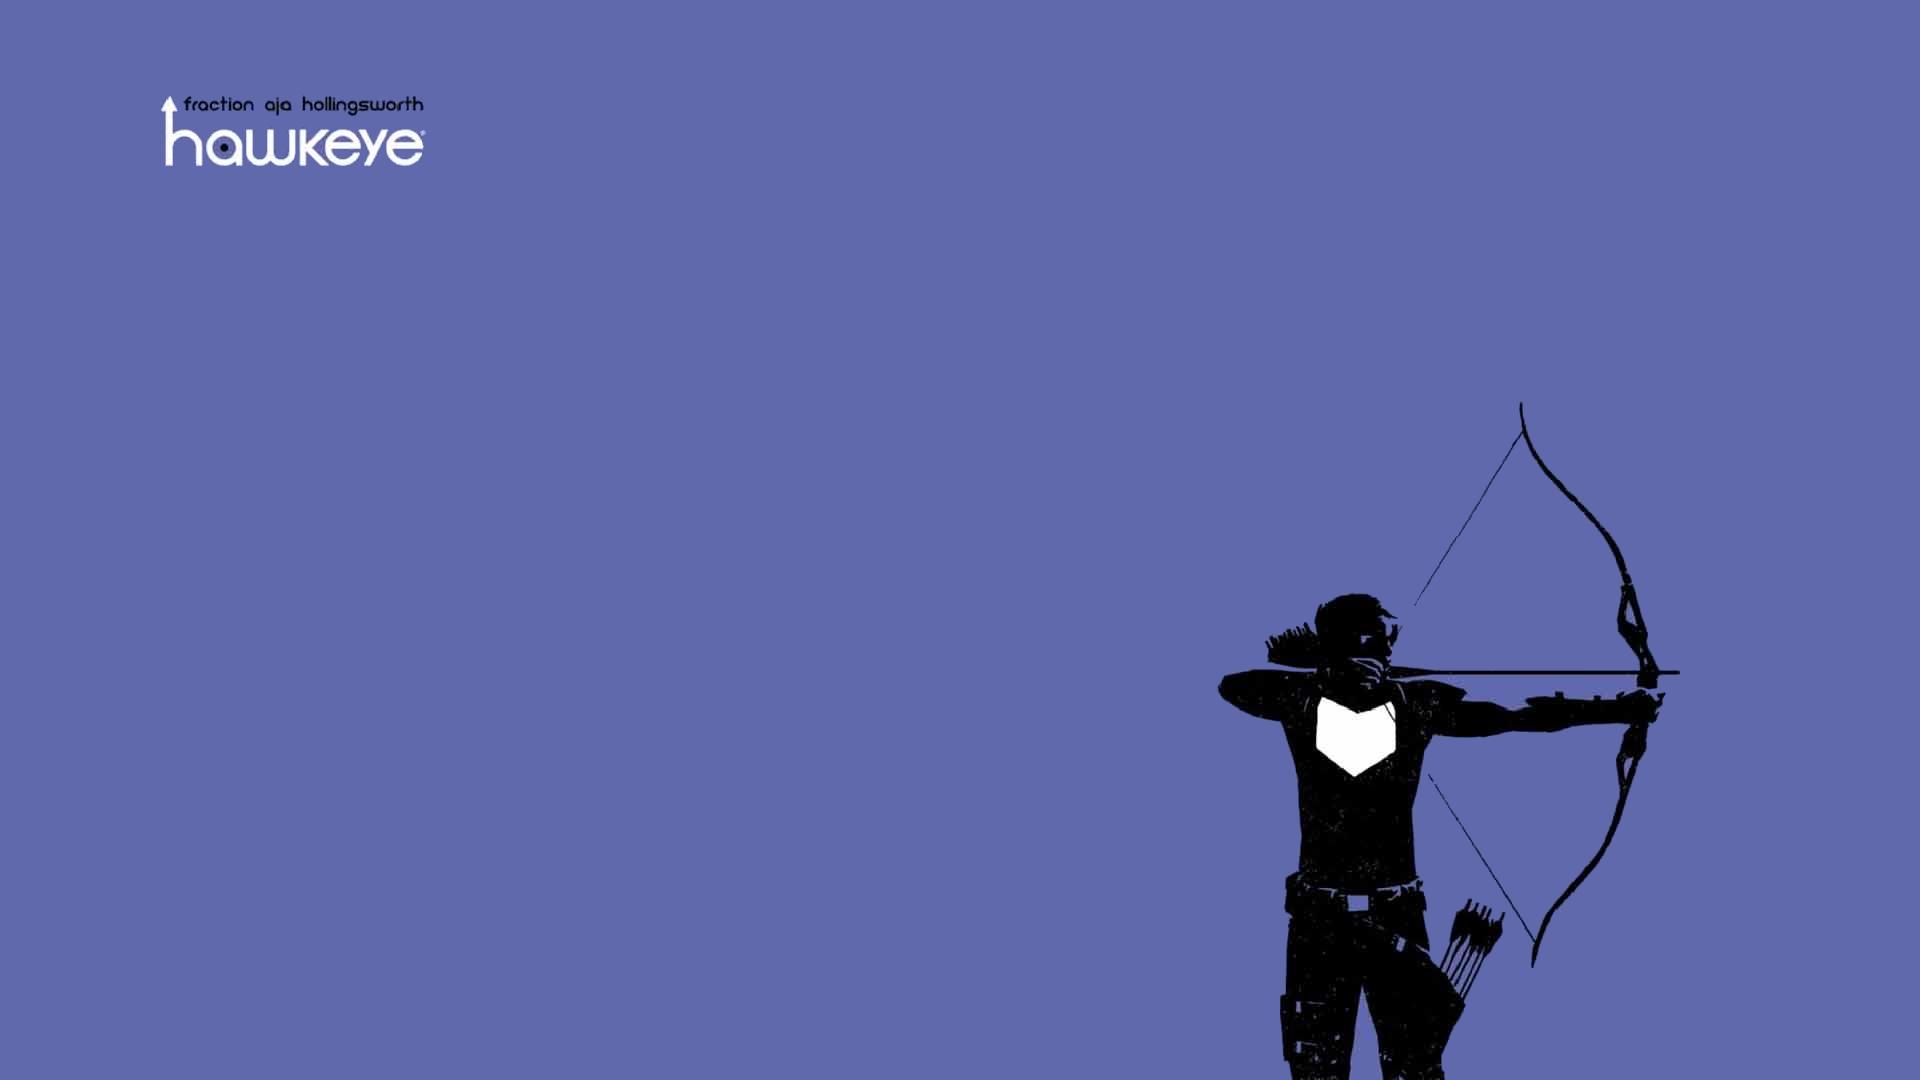 70 Hawkeye HD Wallpapers Backgrounds 1920x1080